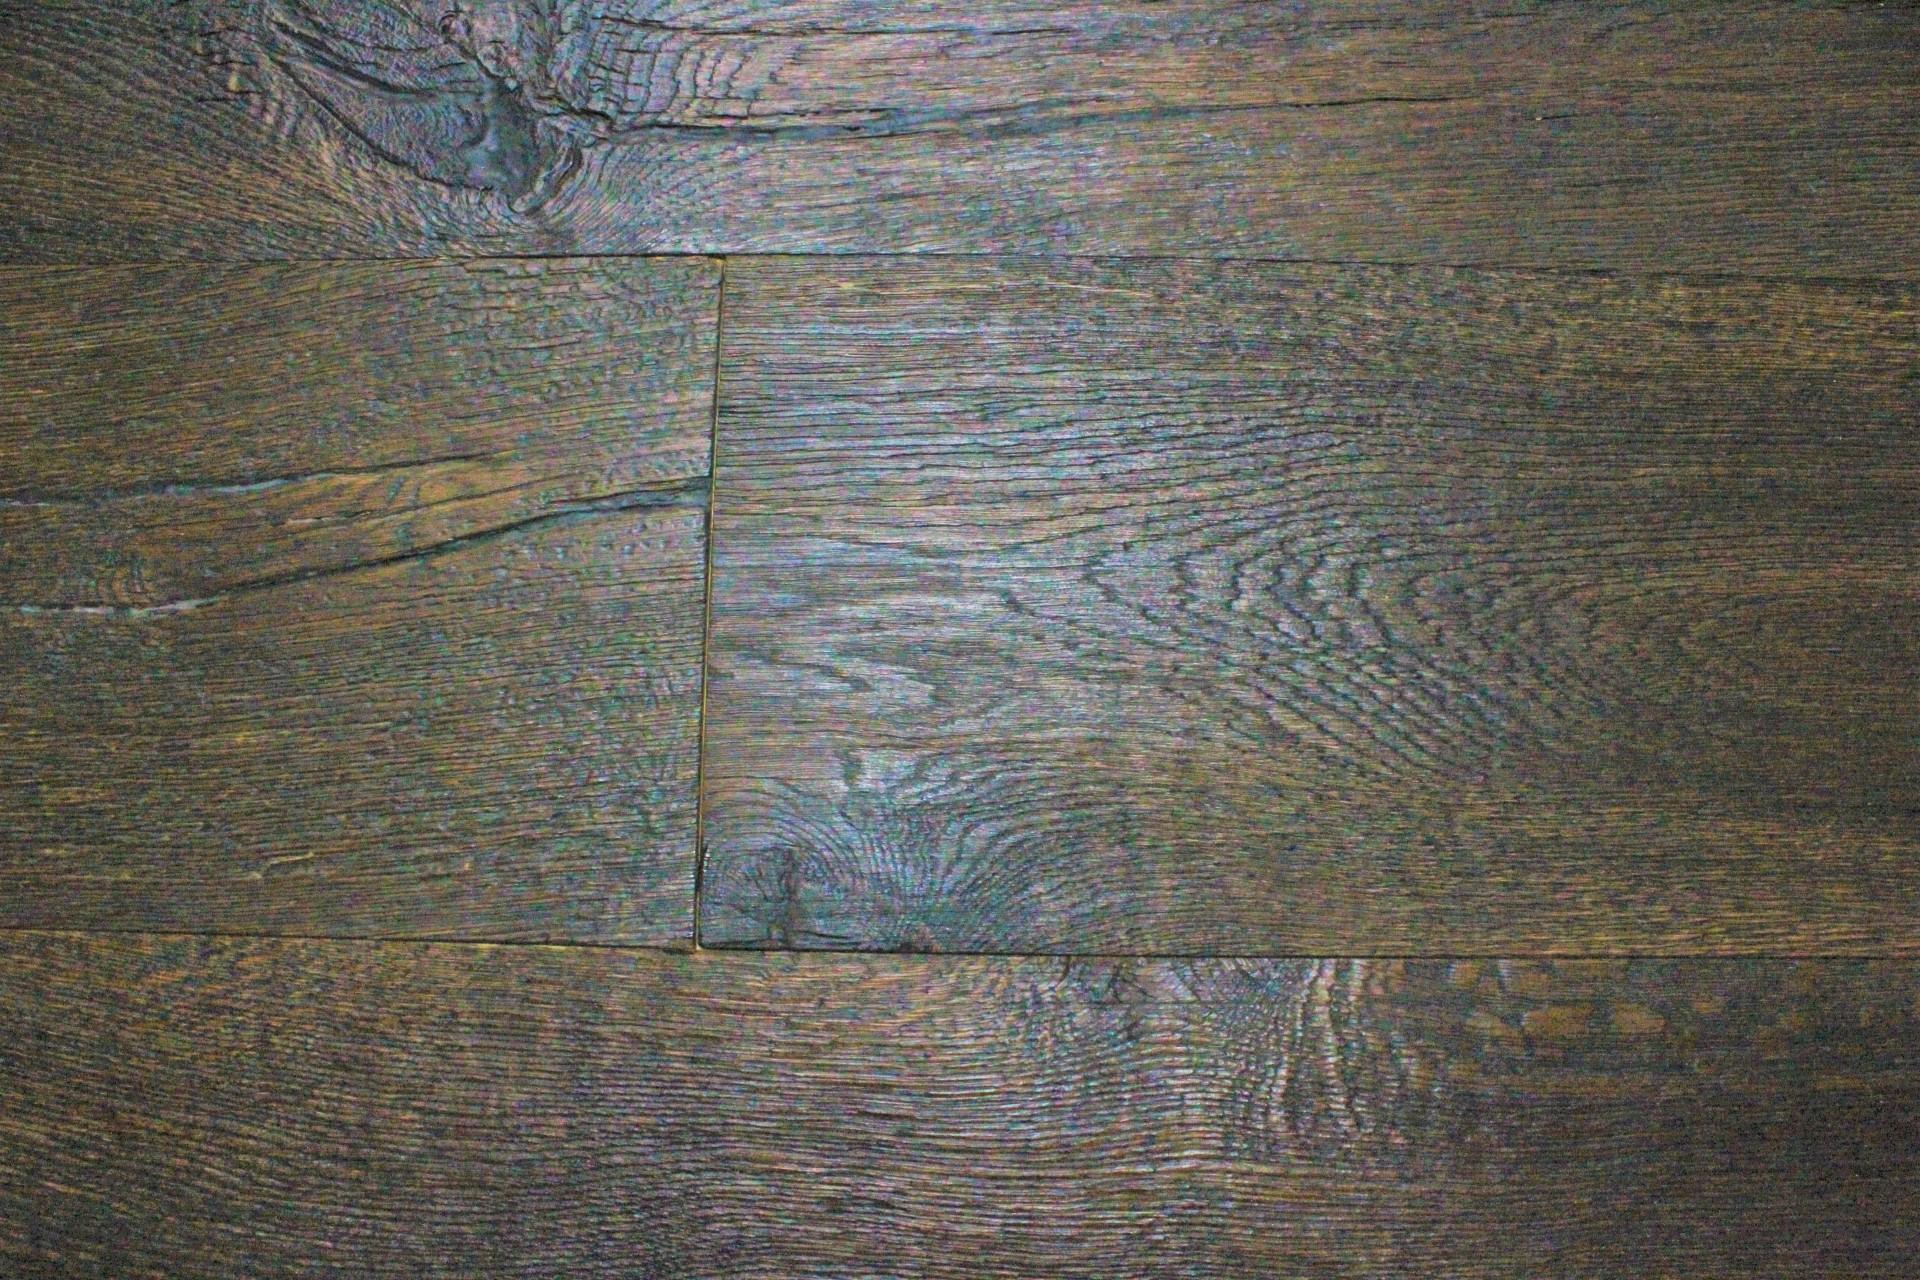 Hardwood, prefinished floor, engineered wood, solid wood, lifestyle, hard surface, prefinished hardwood, prefinished wood, home, design, interior design, wood floor design, castle combe